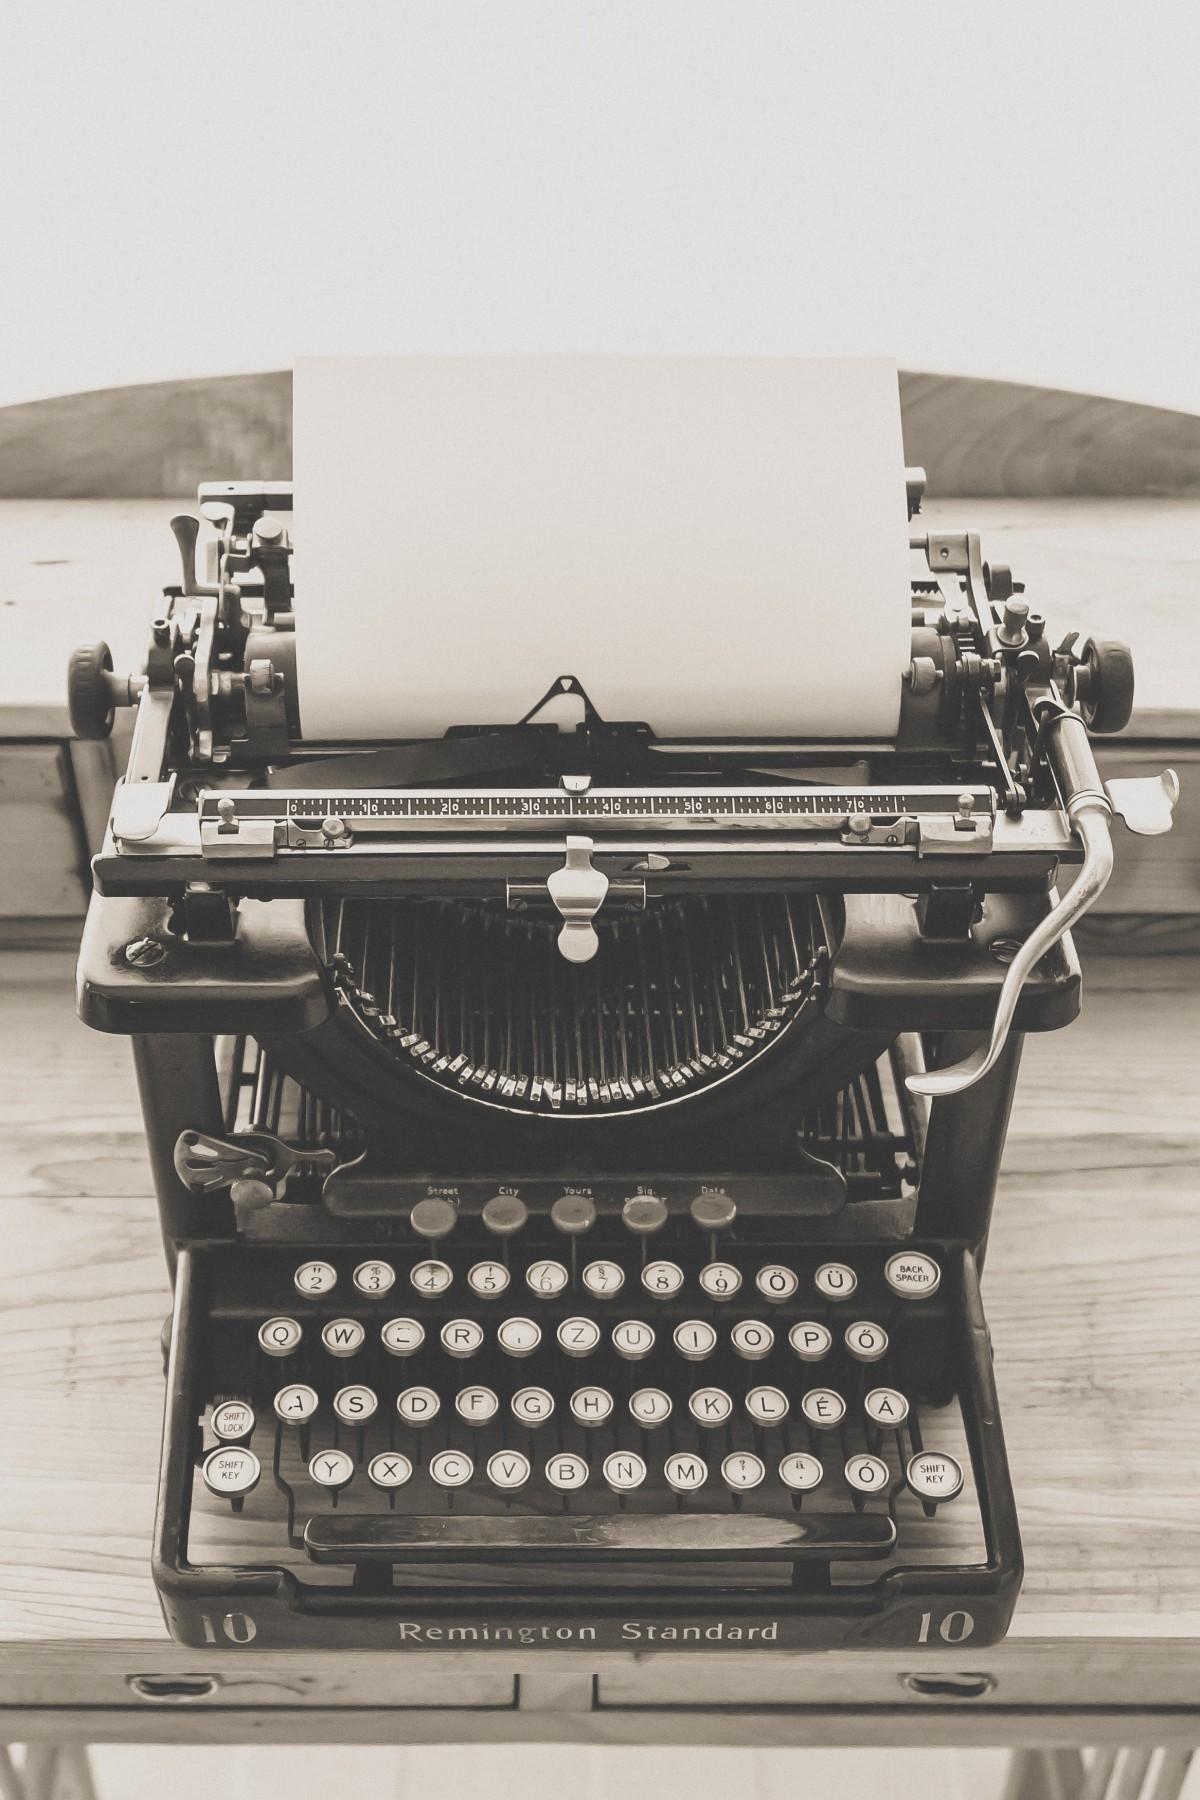 Antique Tractor Keys : Free images typing black and white antique retro old nostalgia monochrome type